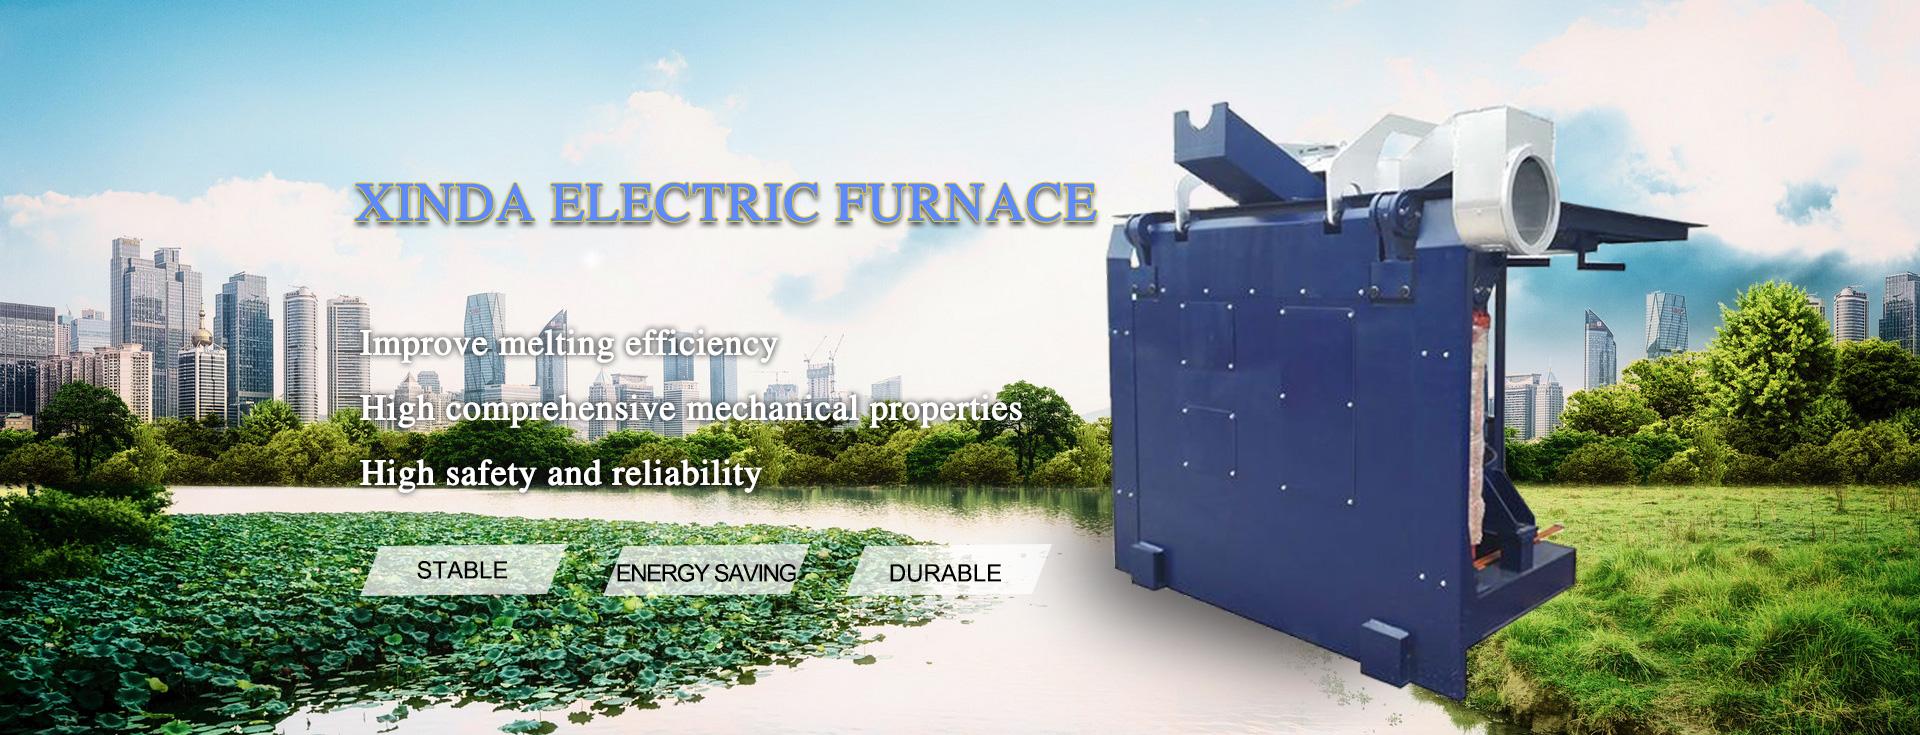 Intermediate frequency furnace equipment